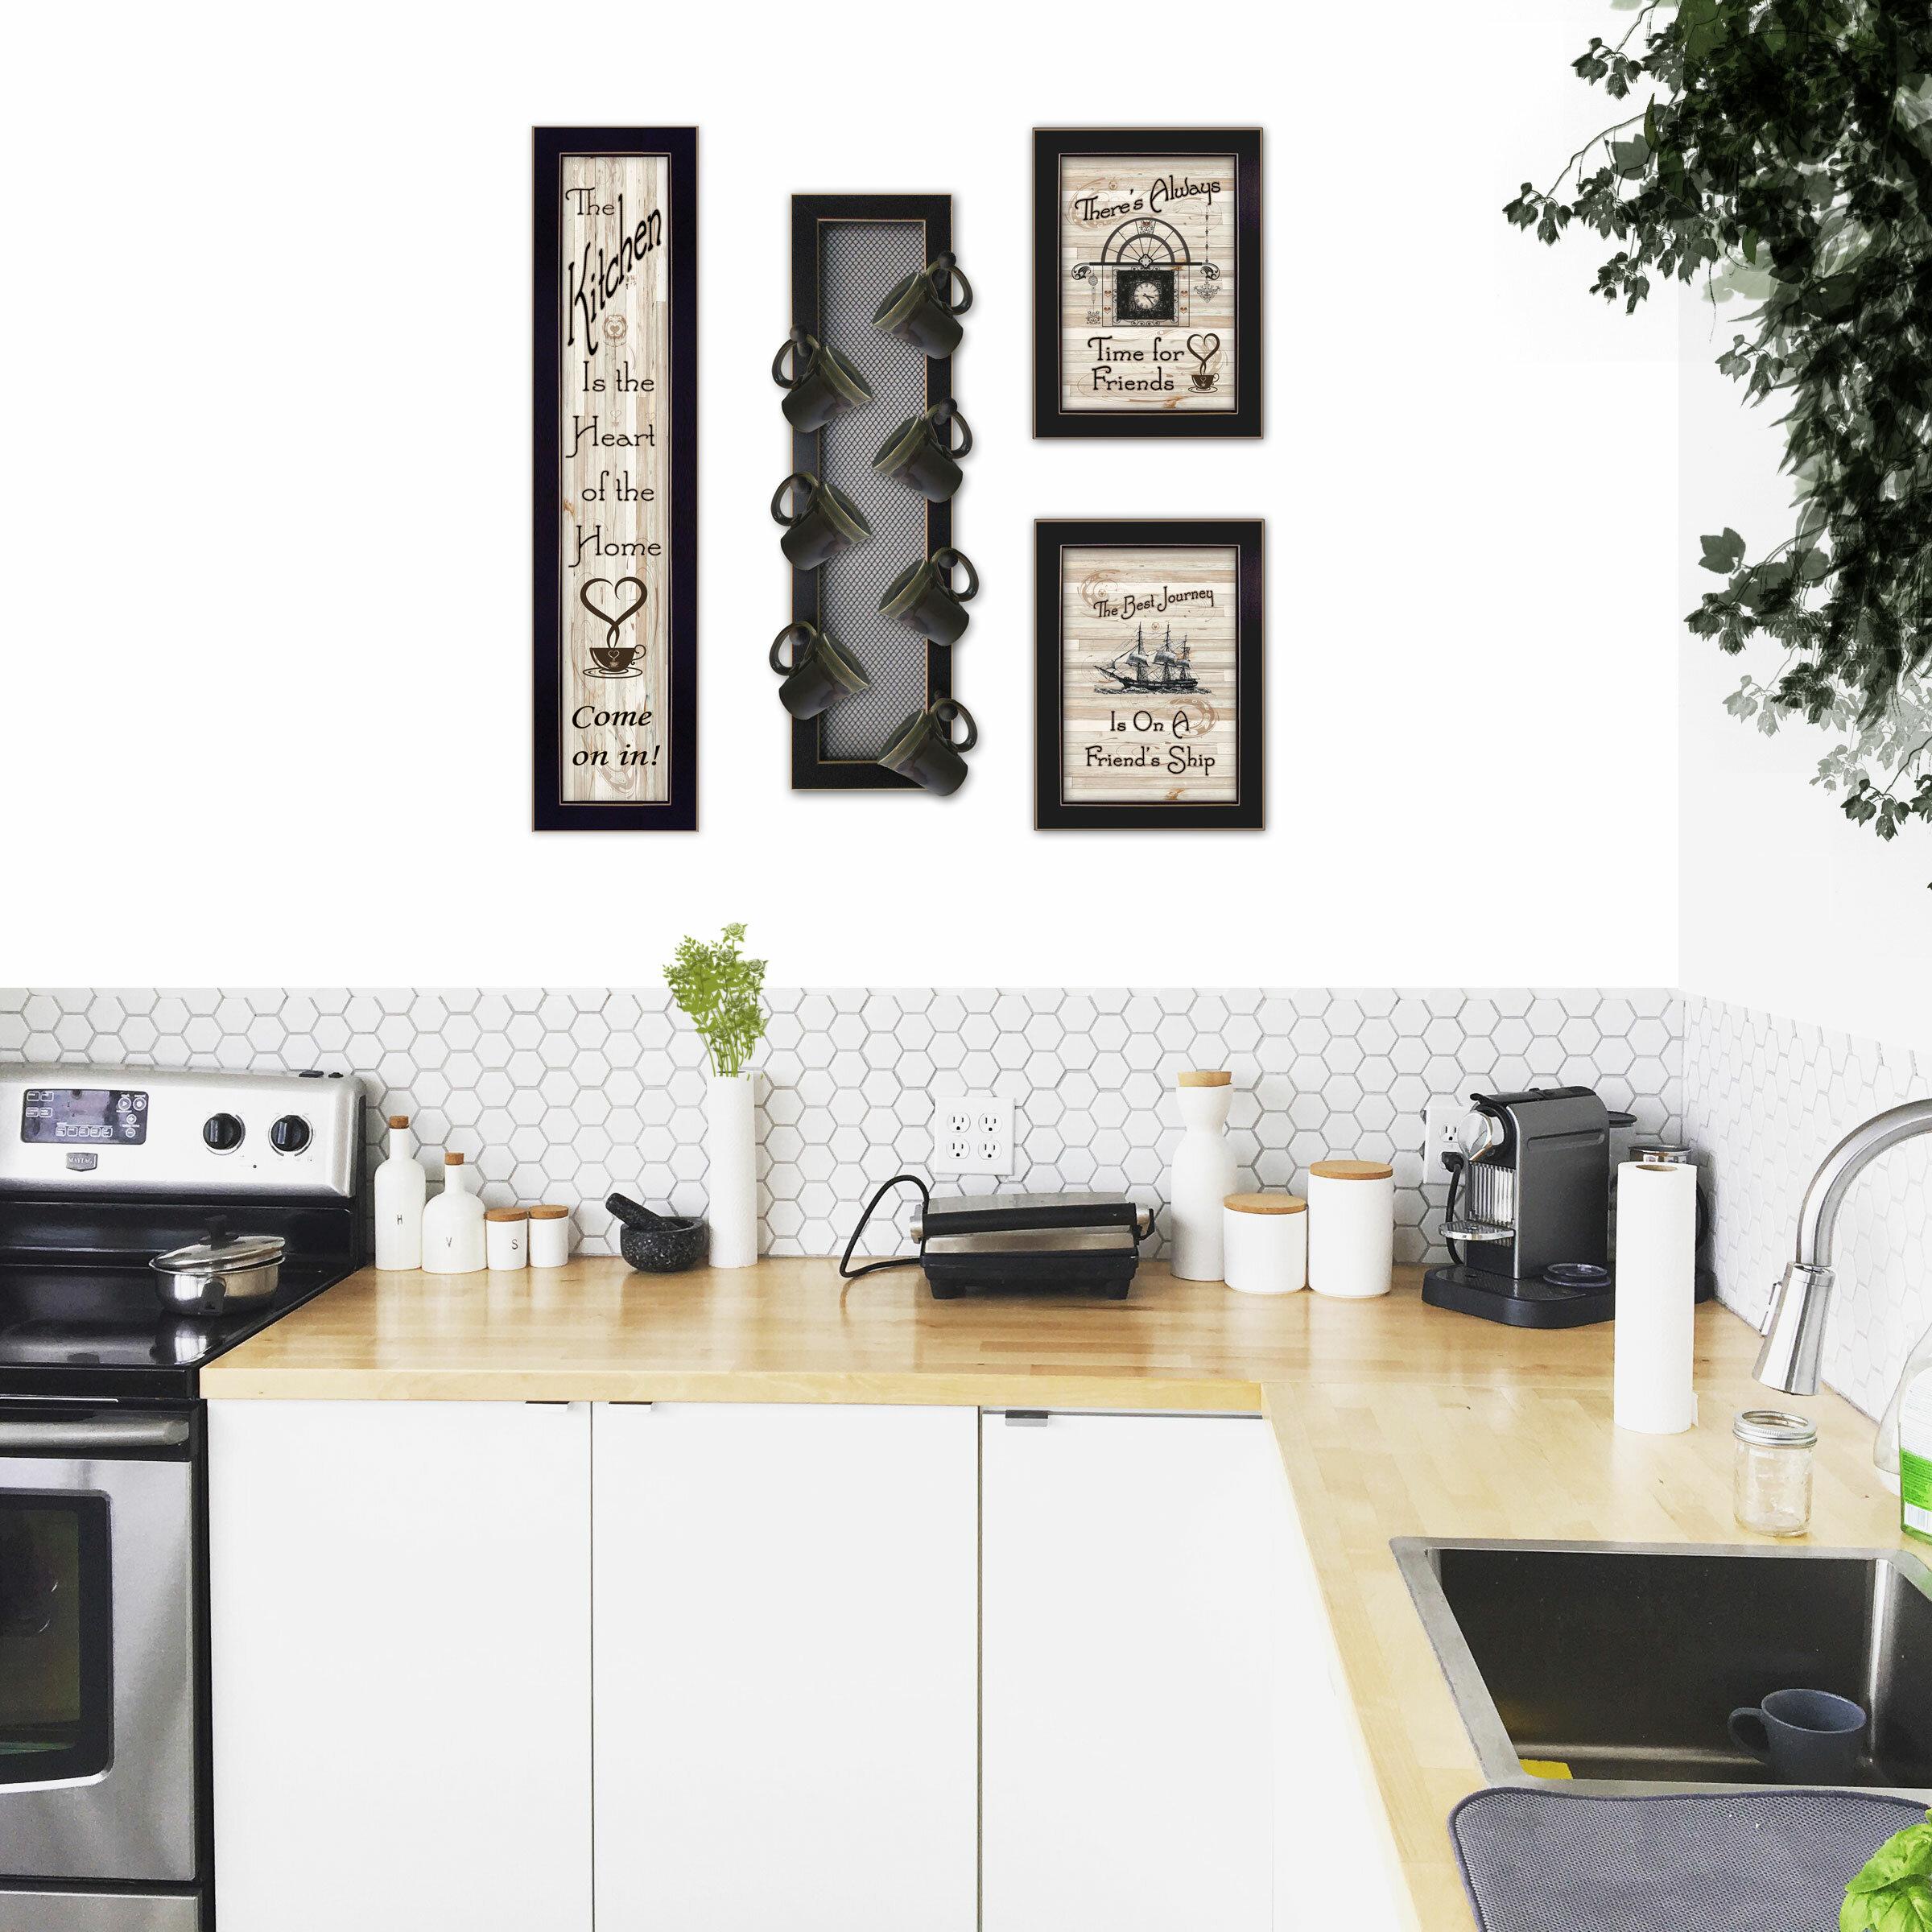 wayfair wall decor kitchen